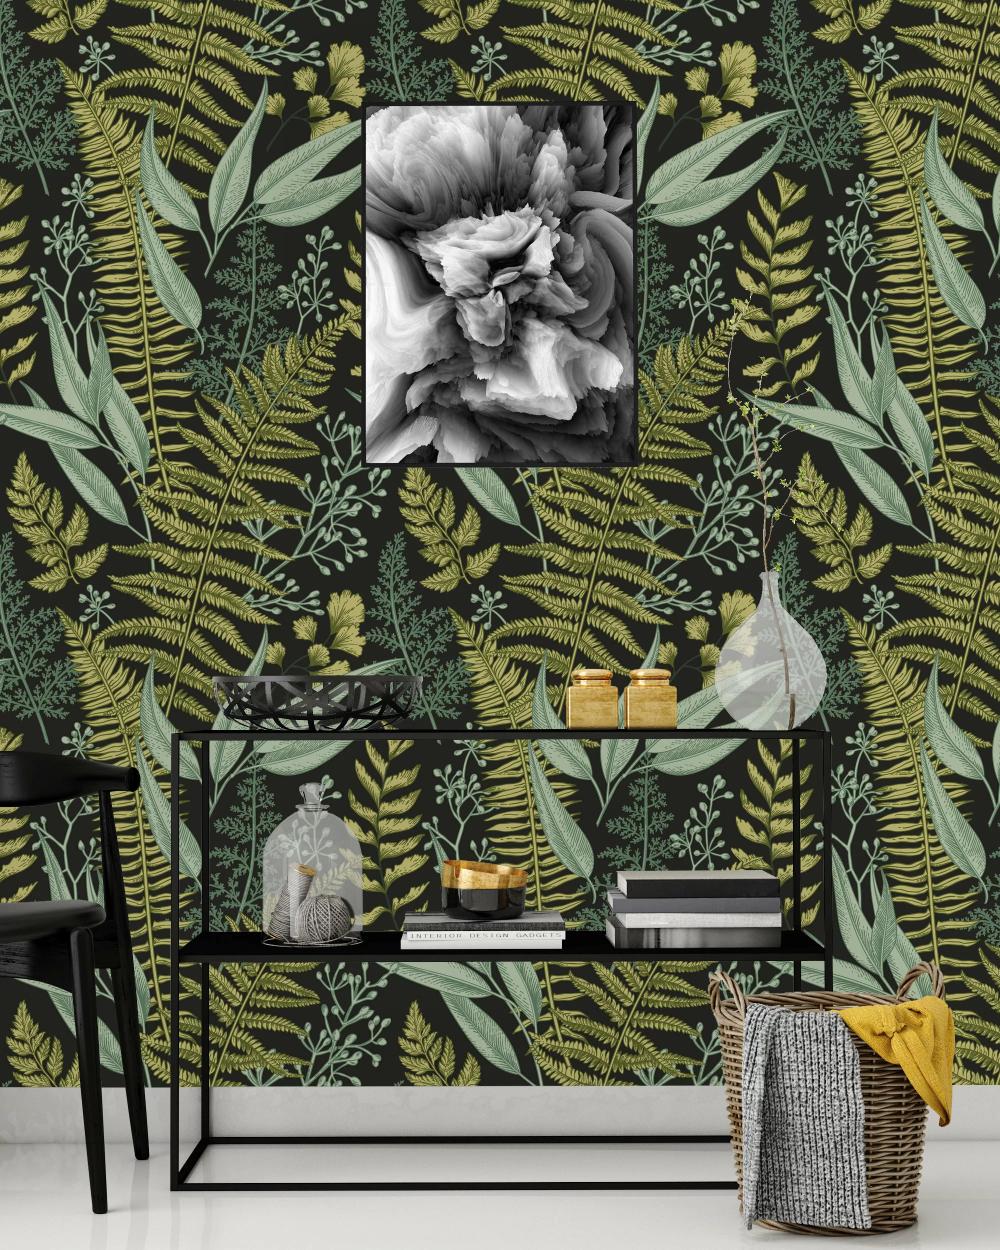 Stourbridge Botanical Ferns 100 L X 25 W Peel And Stick Wallpaper Panel Fern Wallpaper Nursery Mural Removable Wallpaper